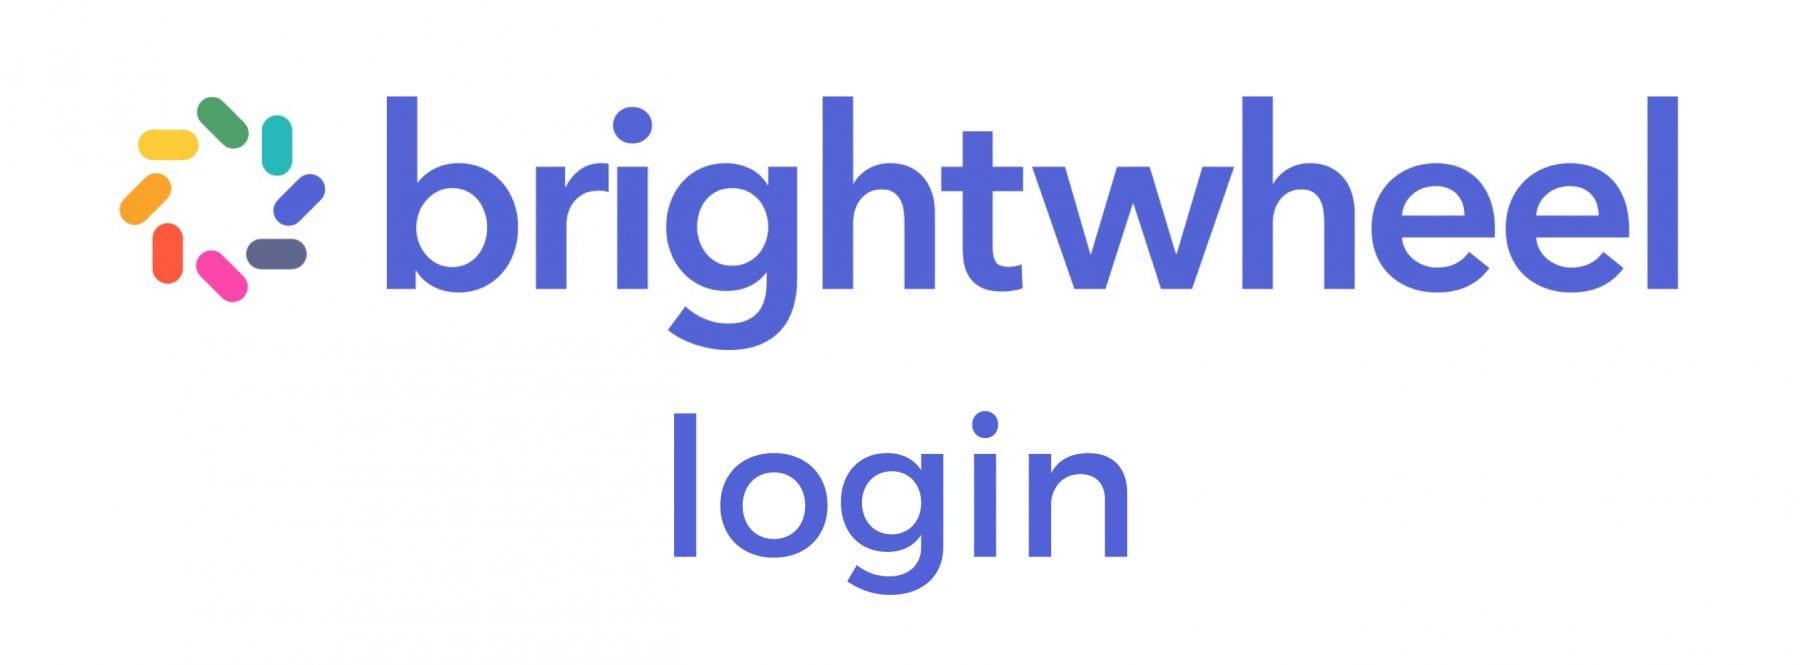 Brightwheel login